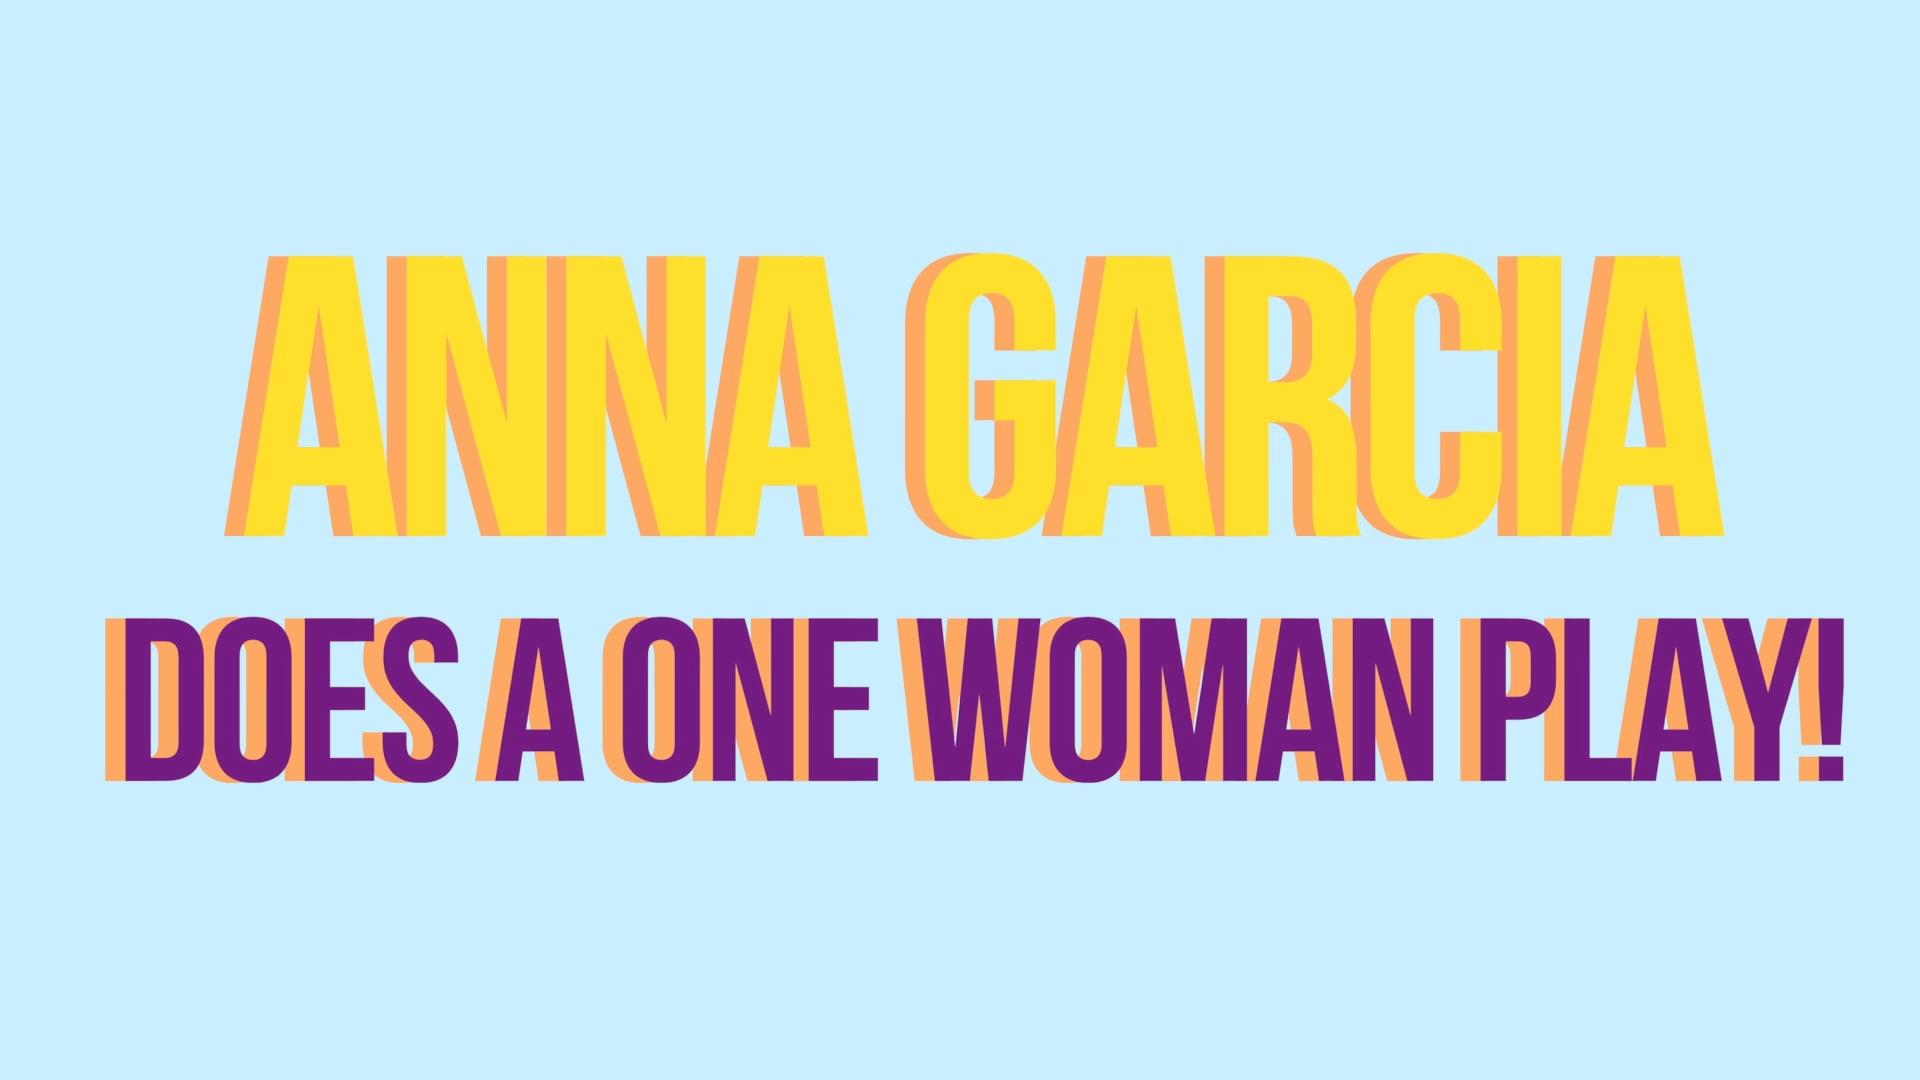 Anna Garcia Does A One Woman Play